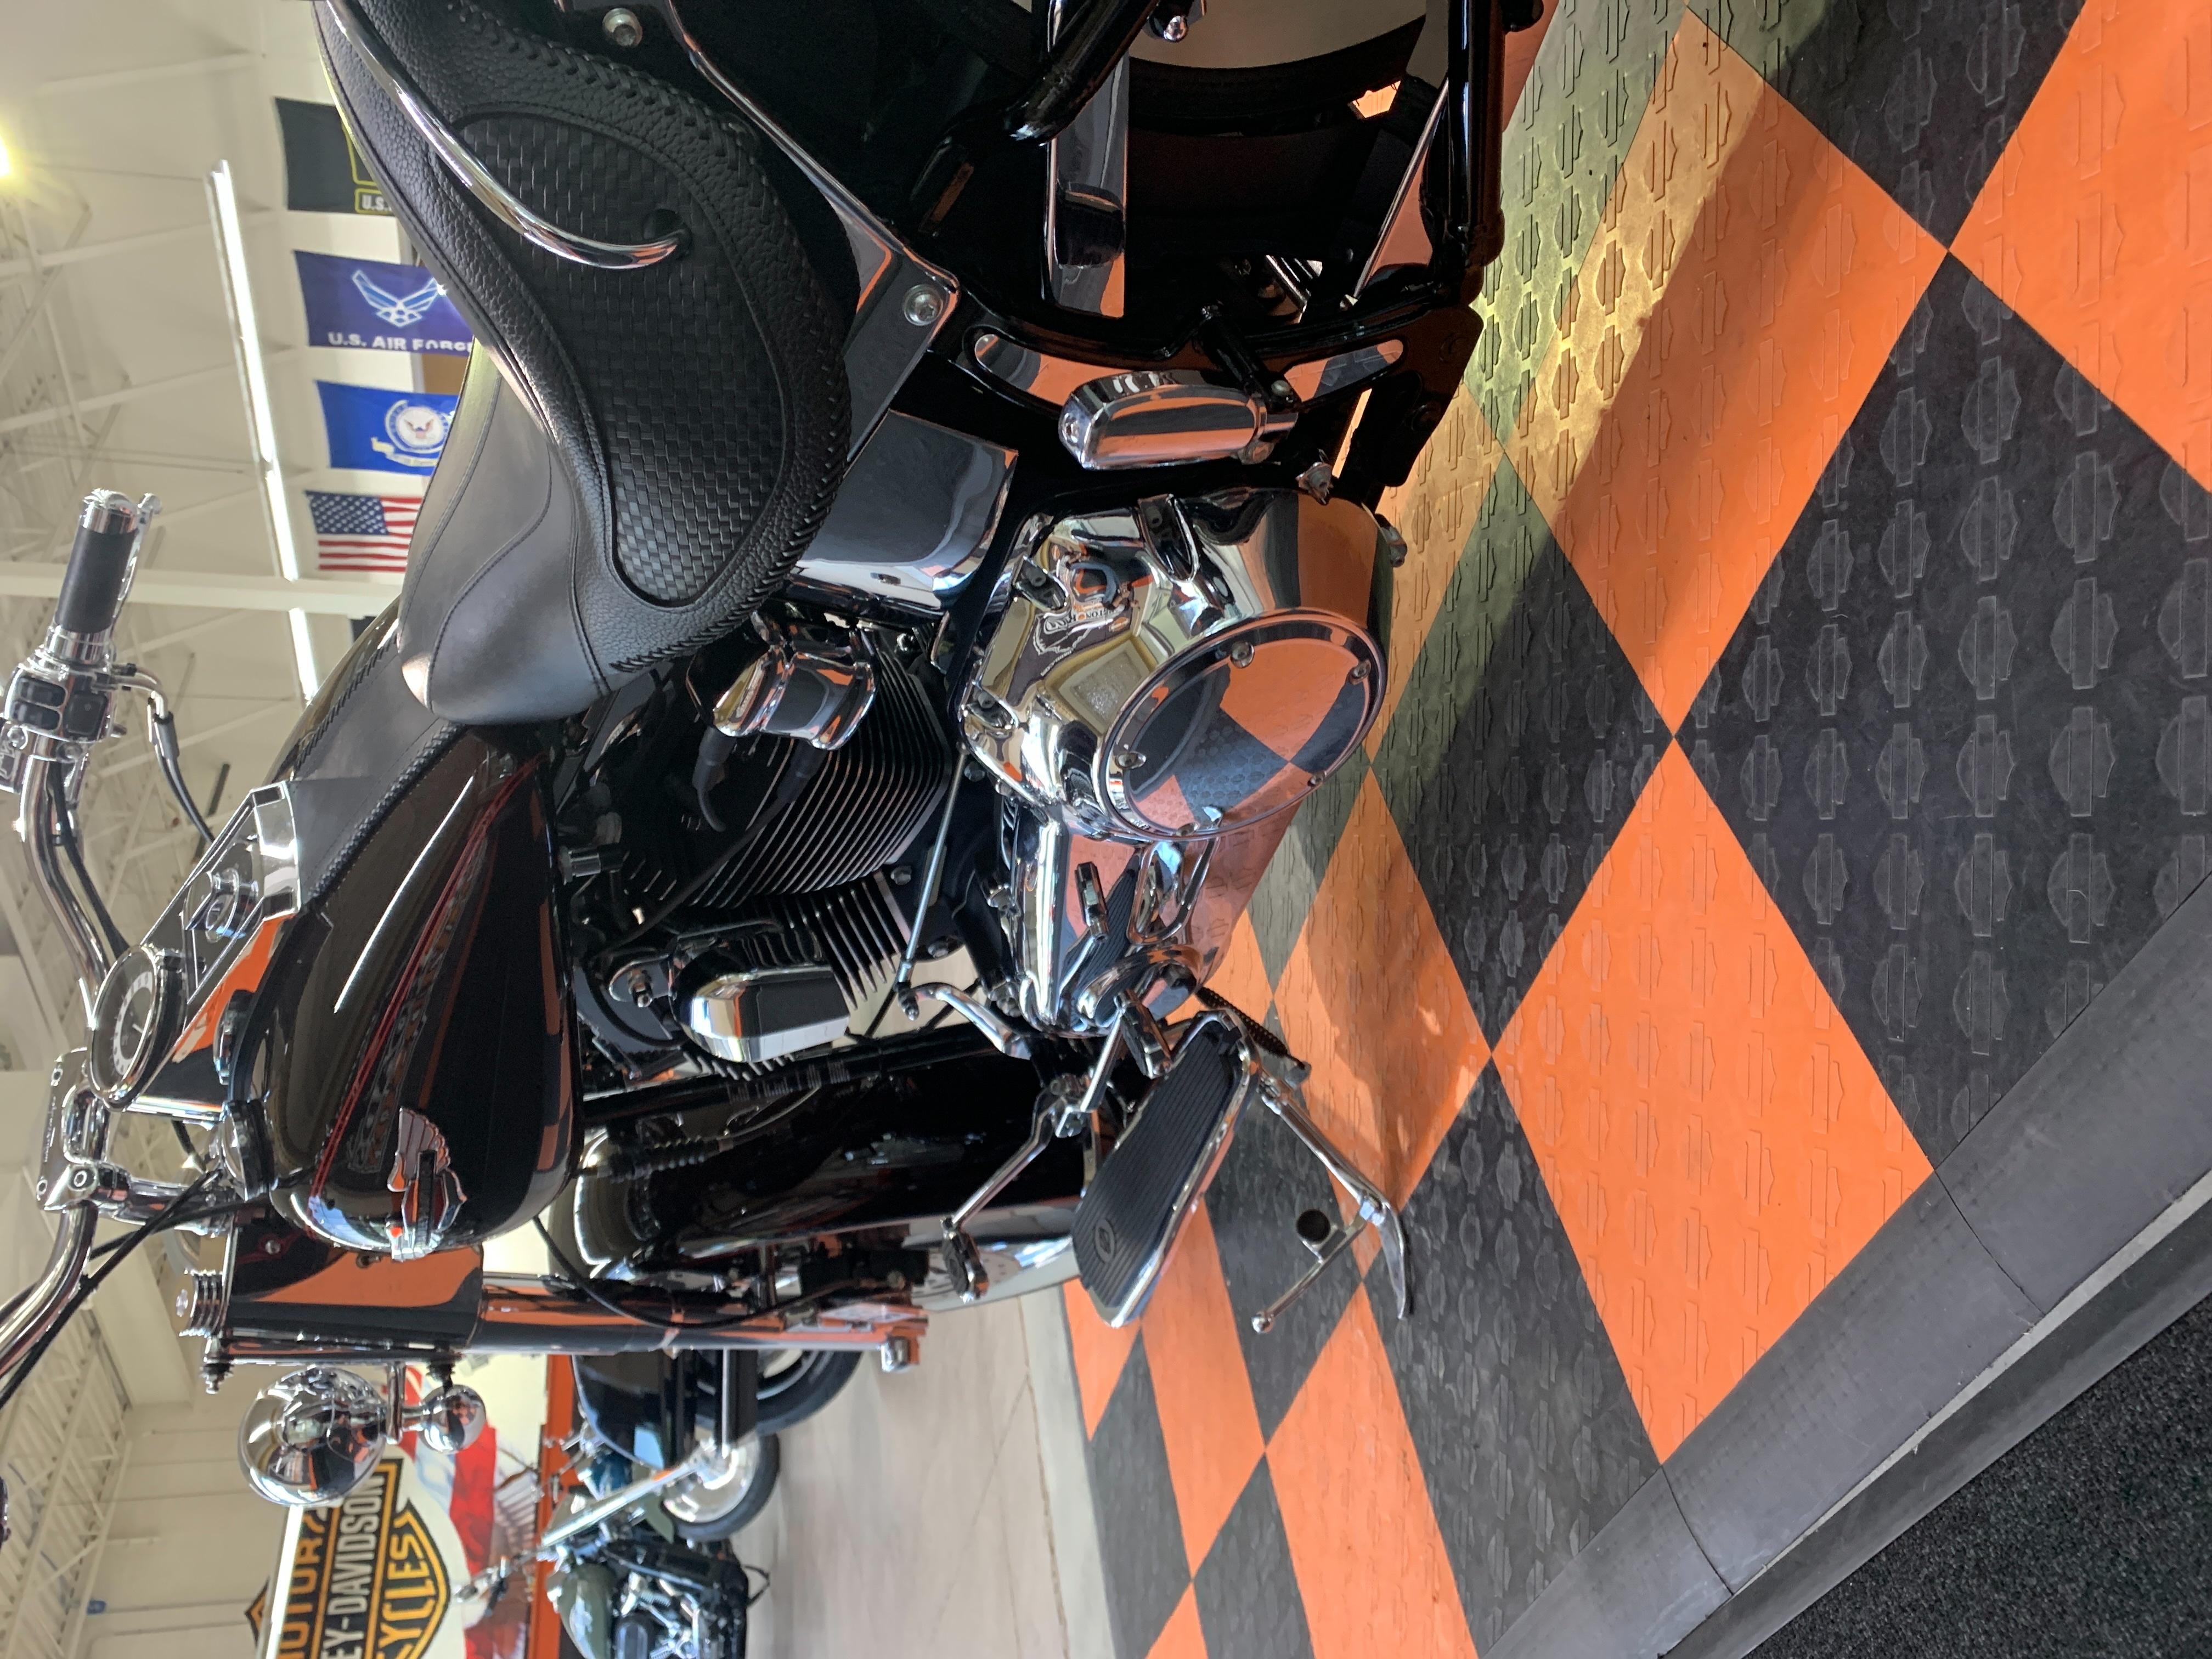 2011 Harley-Davidson Softail Deluxe at Hampton Roads Harley-Davidson